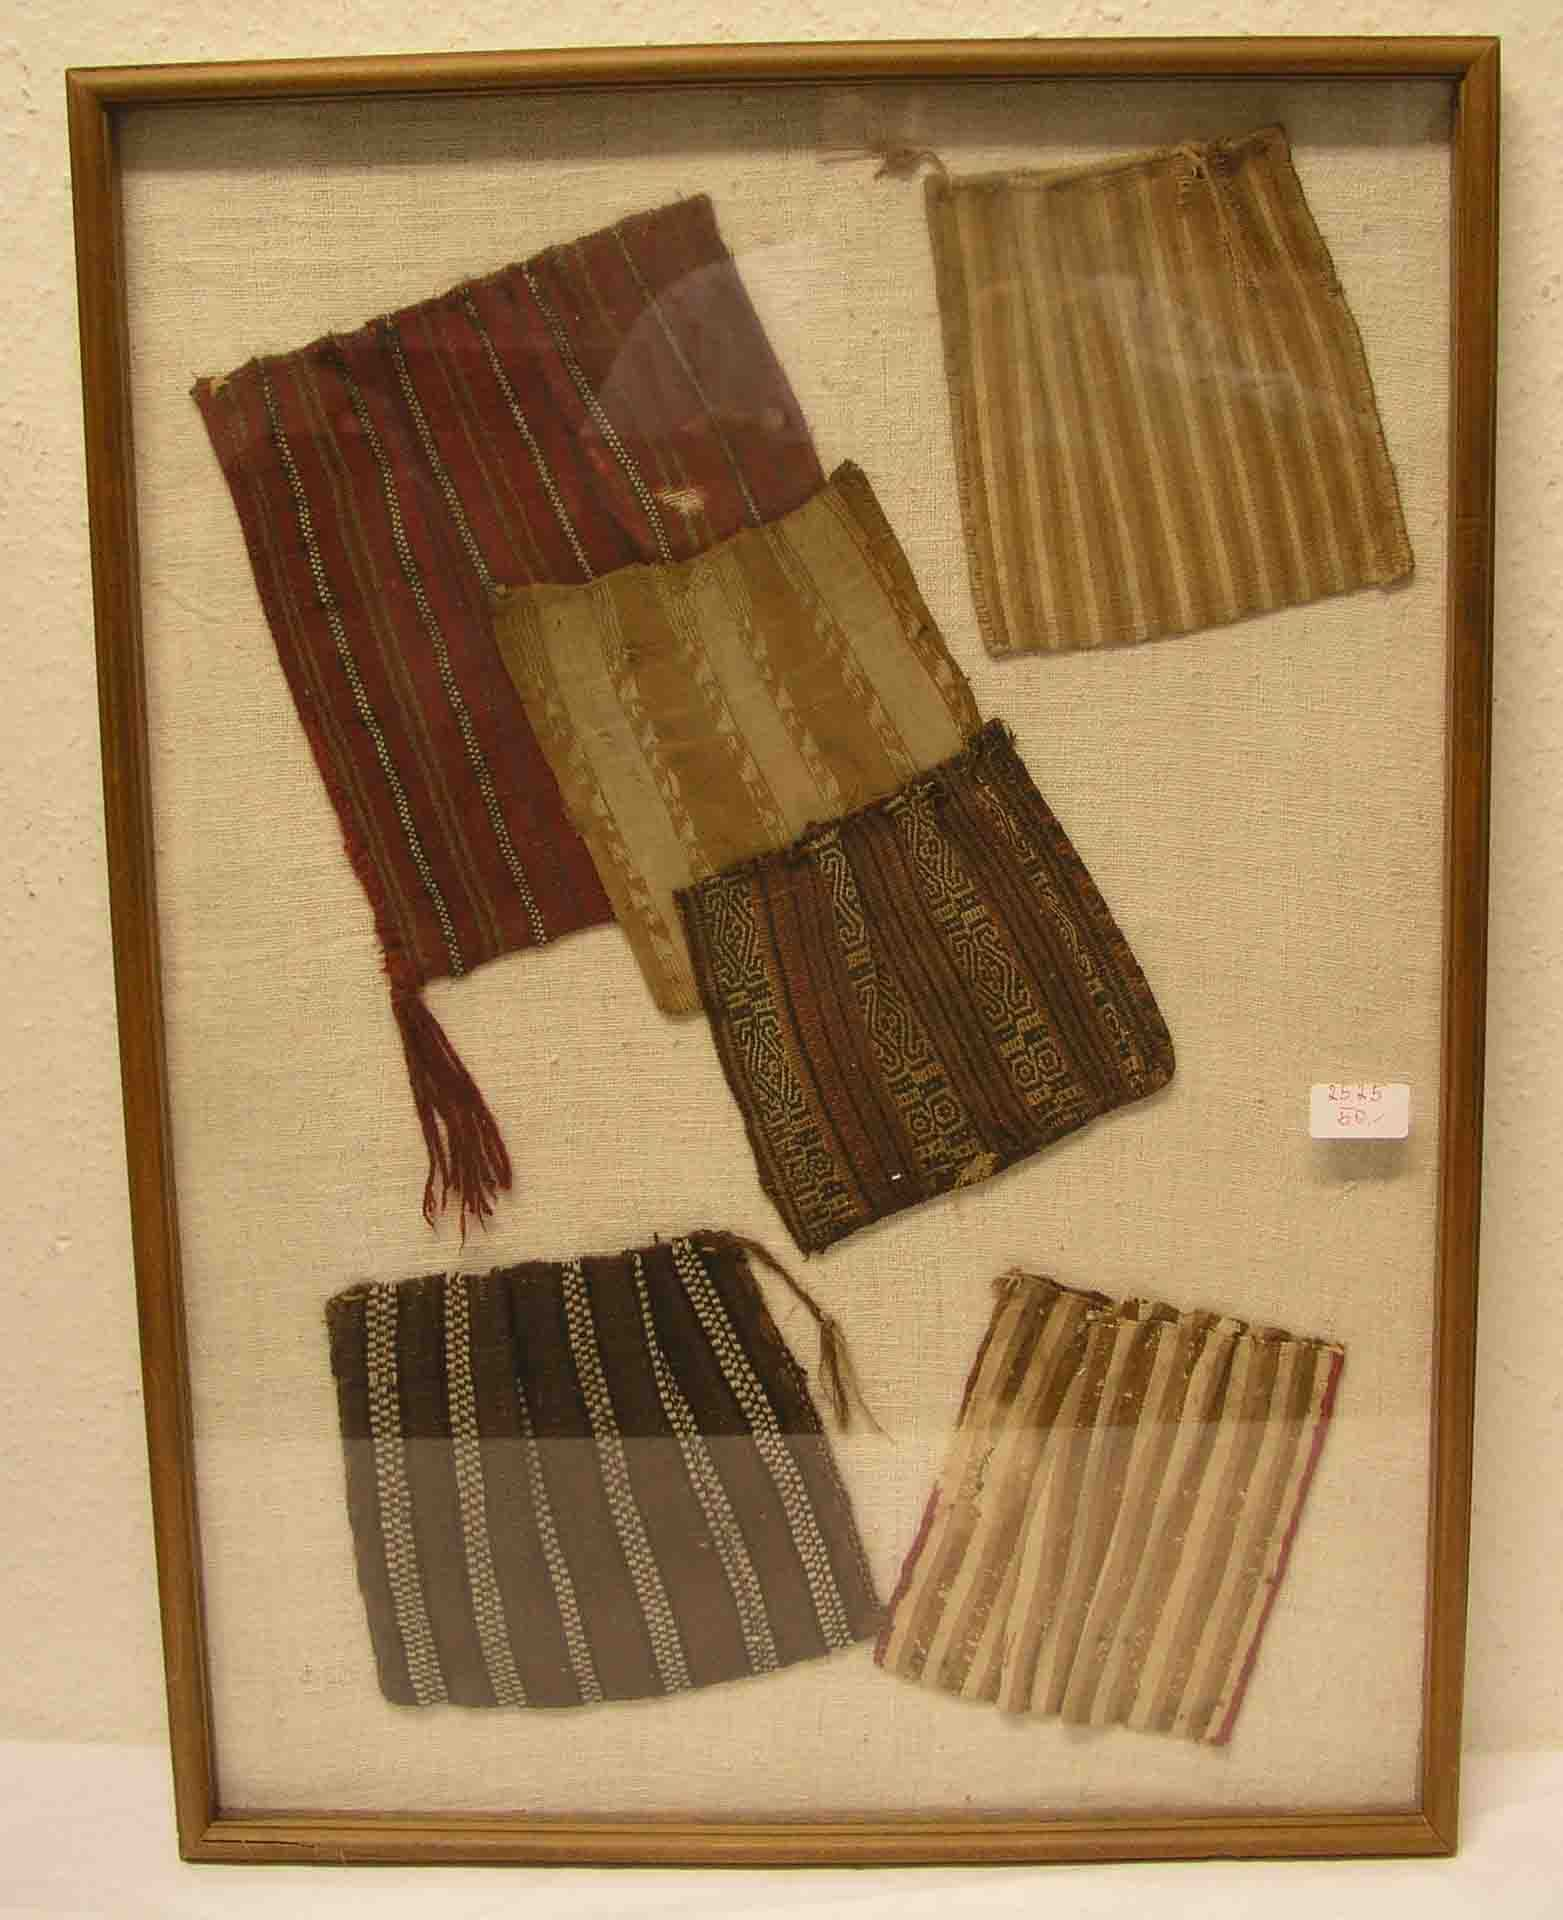 Inka - Textilarbeiten. Sechs